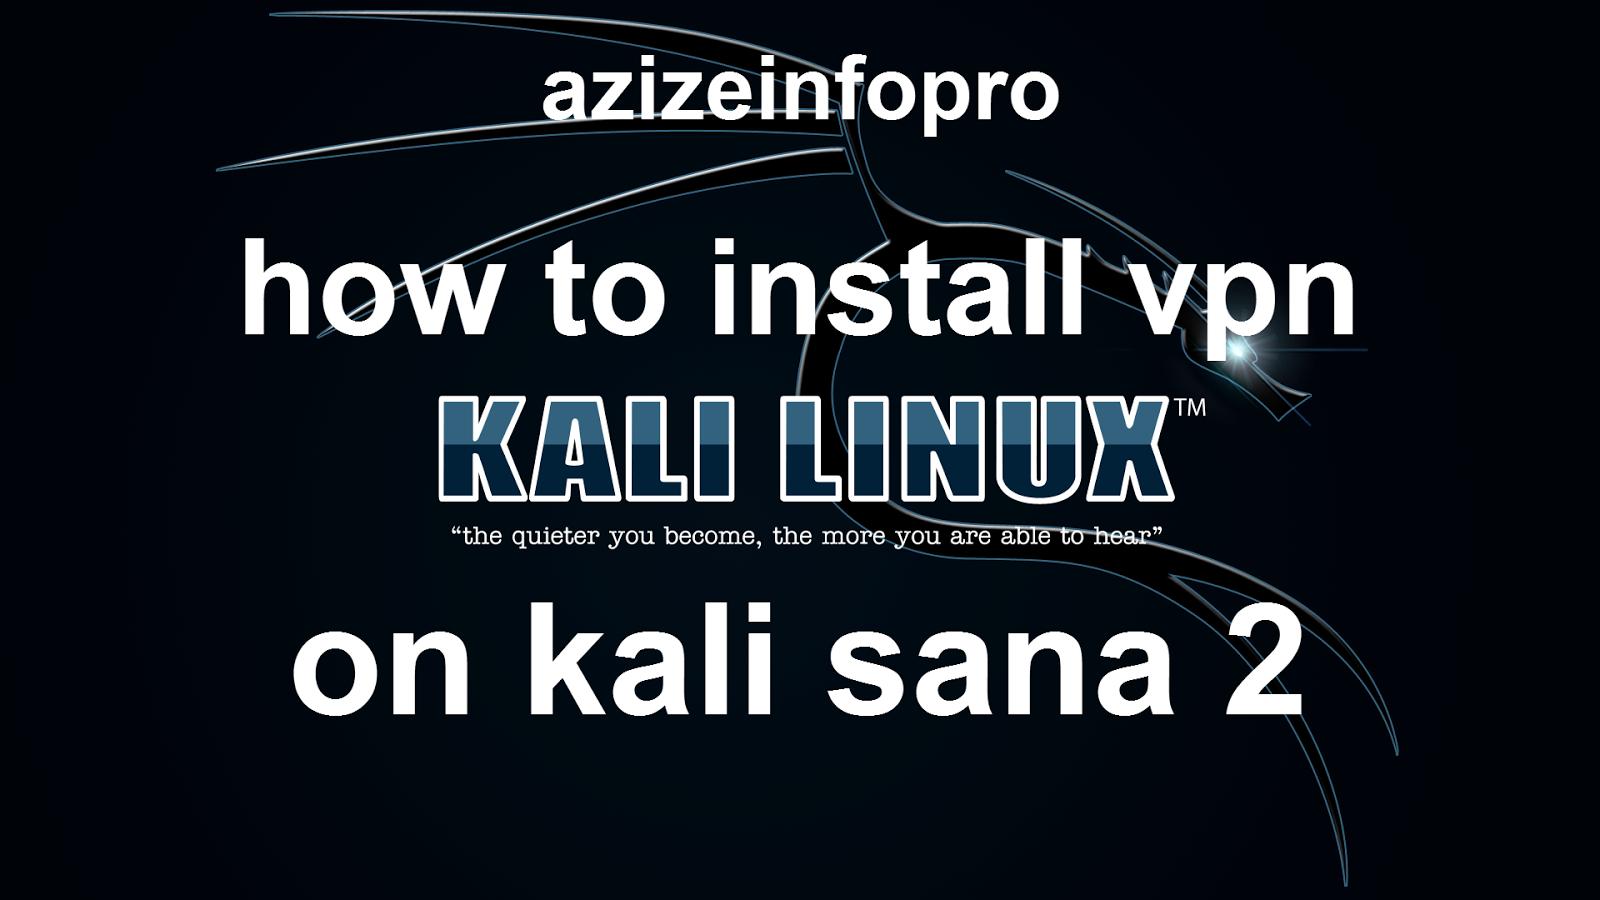 Kali linux 2017 install virtualbox guest additions | Peatix